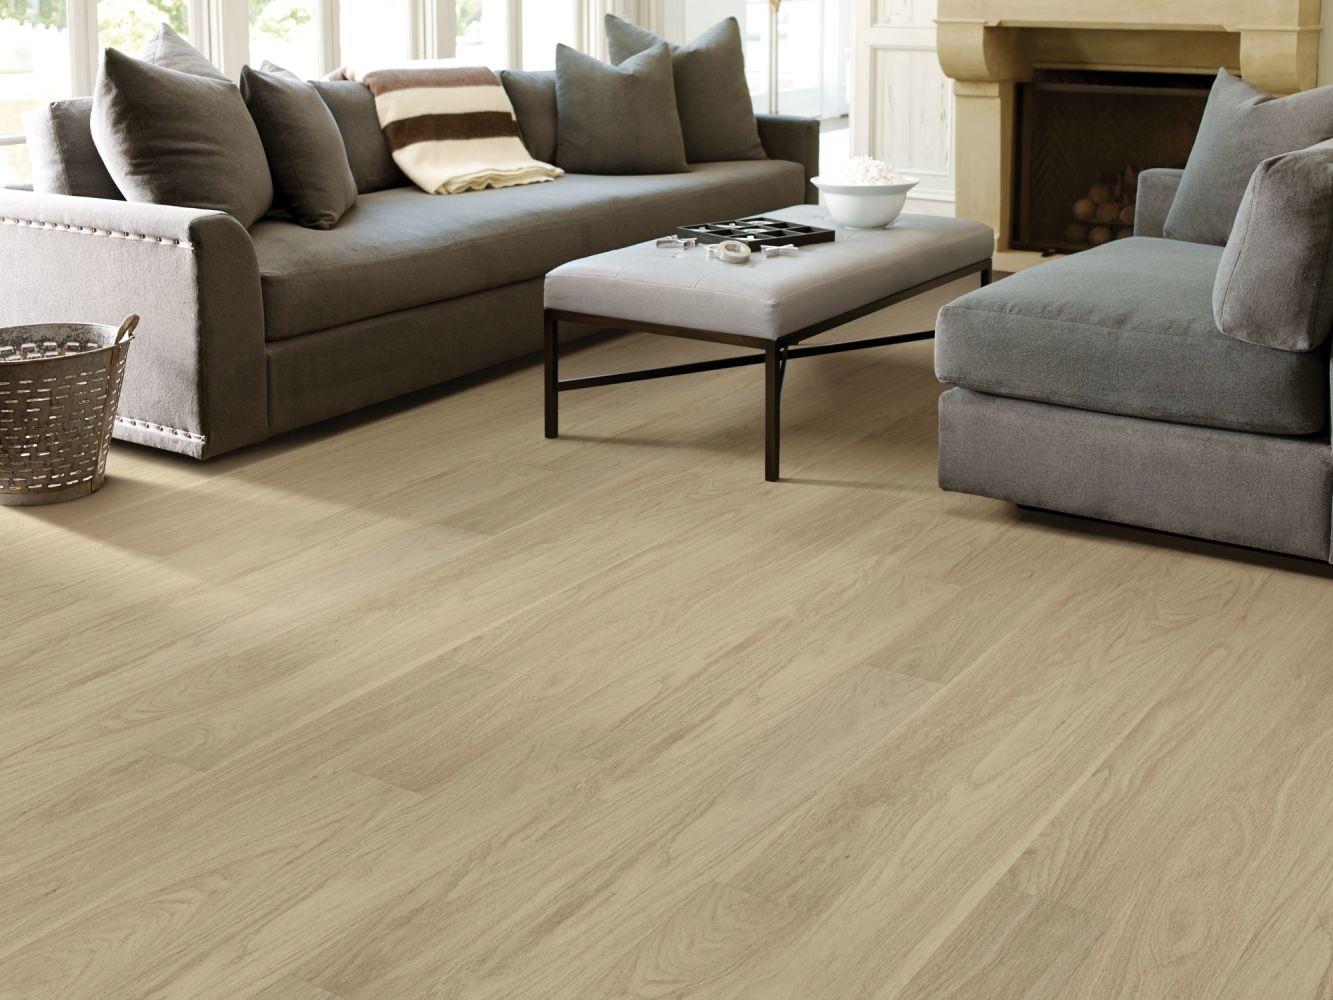 Shaw Floors Vinyl Home Foundations Tracery Plus Stadium 00155_512RG